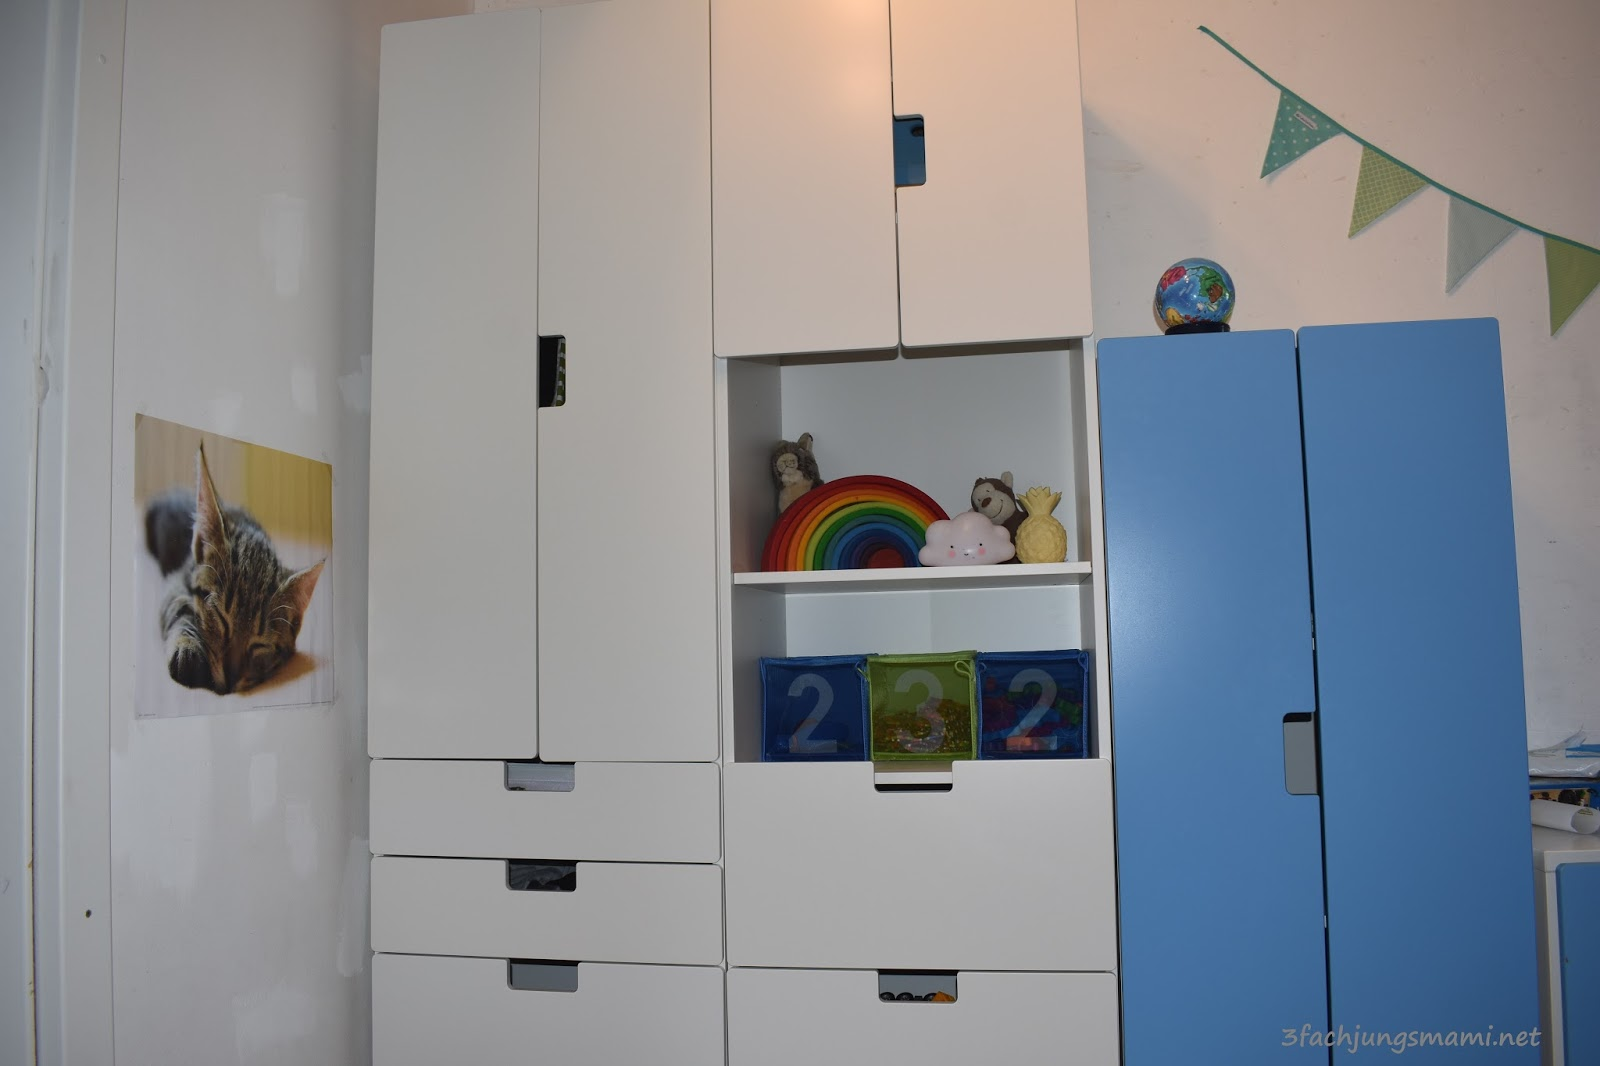 Kinderzimmer sebastian roomtour 3 fach jungsmami for Kinderzimmer ikea